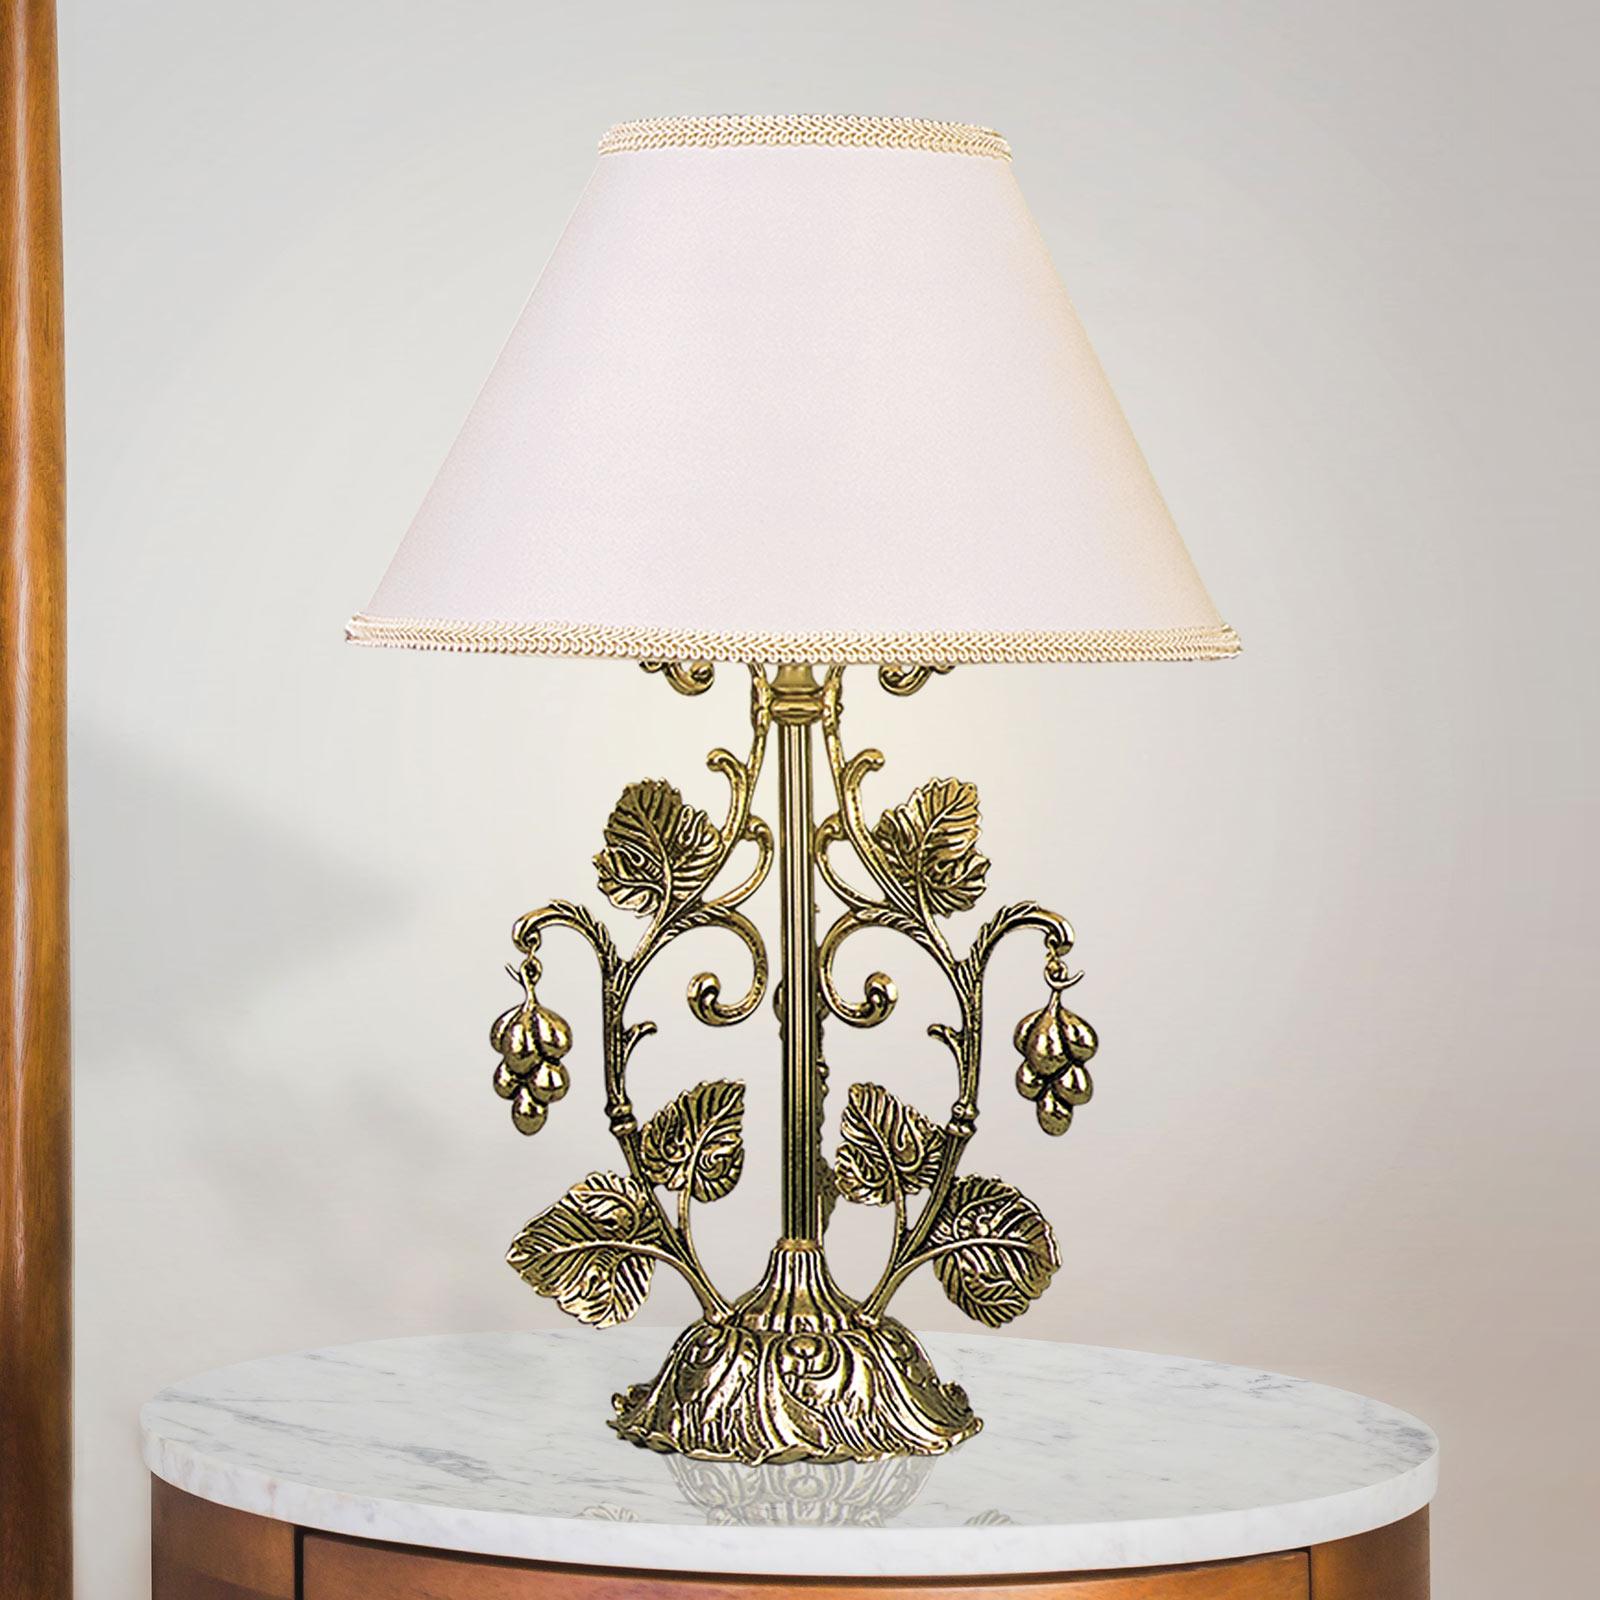 Lampe à poser Albero dorée brunie polie, blanche